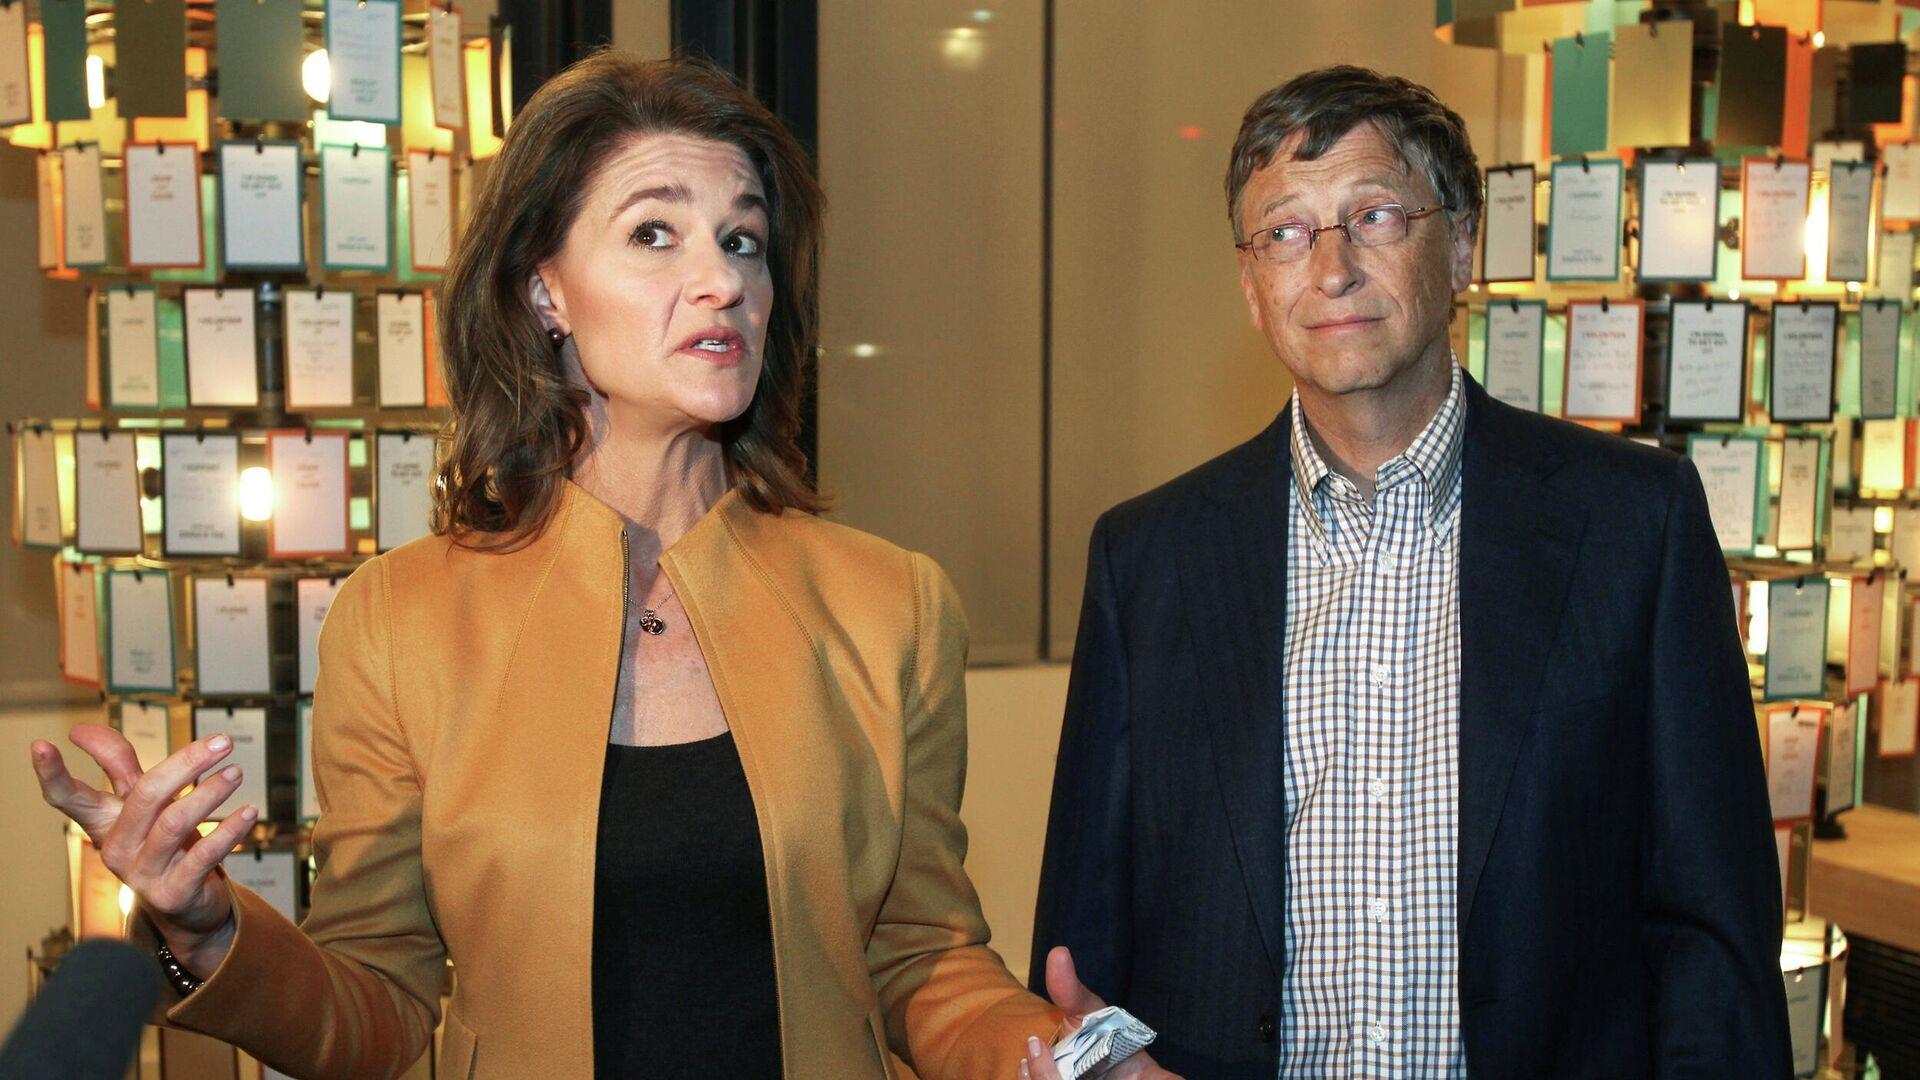 Bill y Melinda Gates en 2012 - Sputnik Mundo, 1920, 28.05.2021